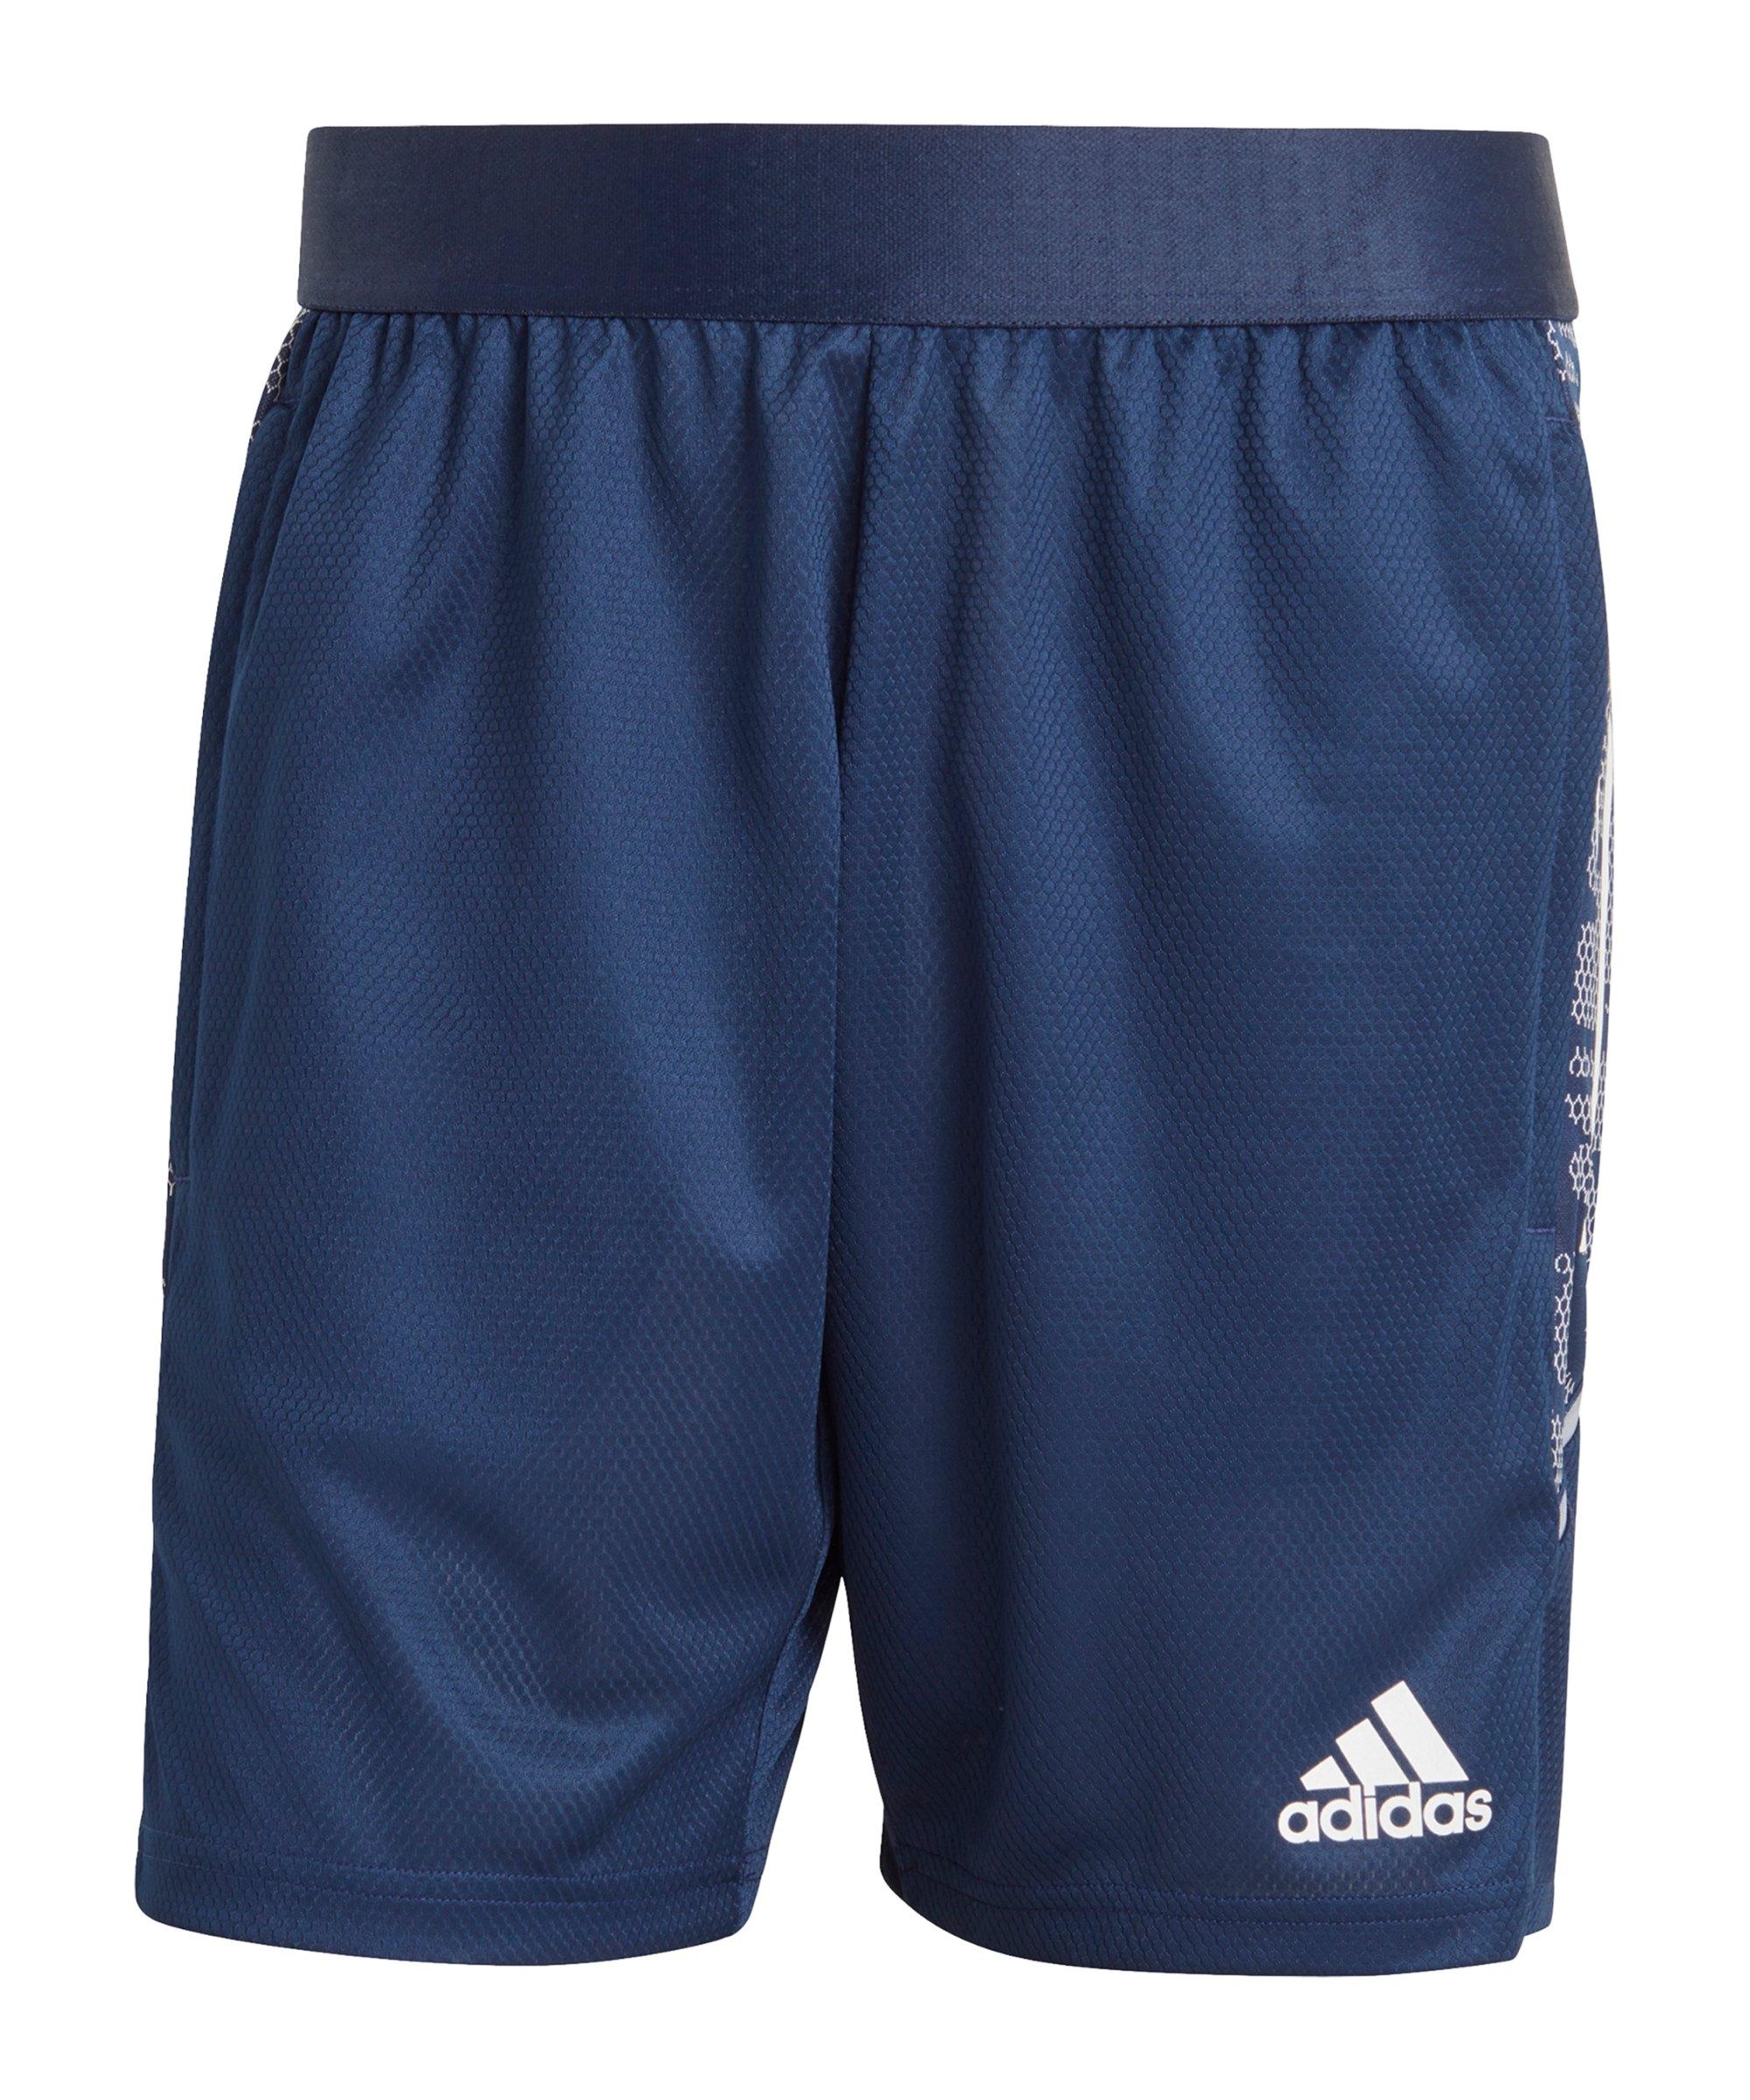 adidas Condivo 21 Short Dunkelblau Weiss - blau